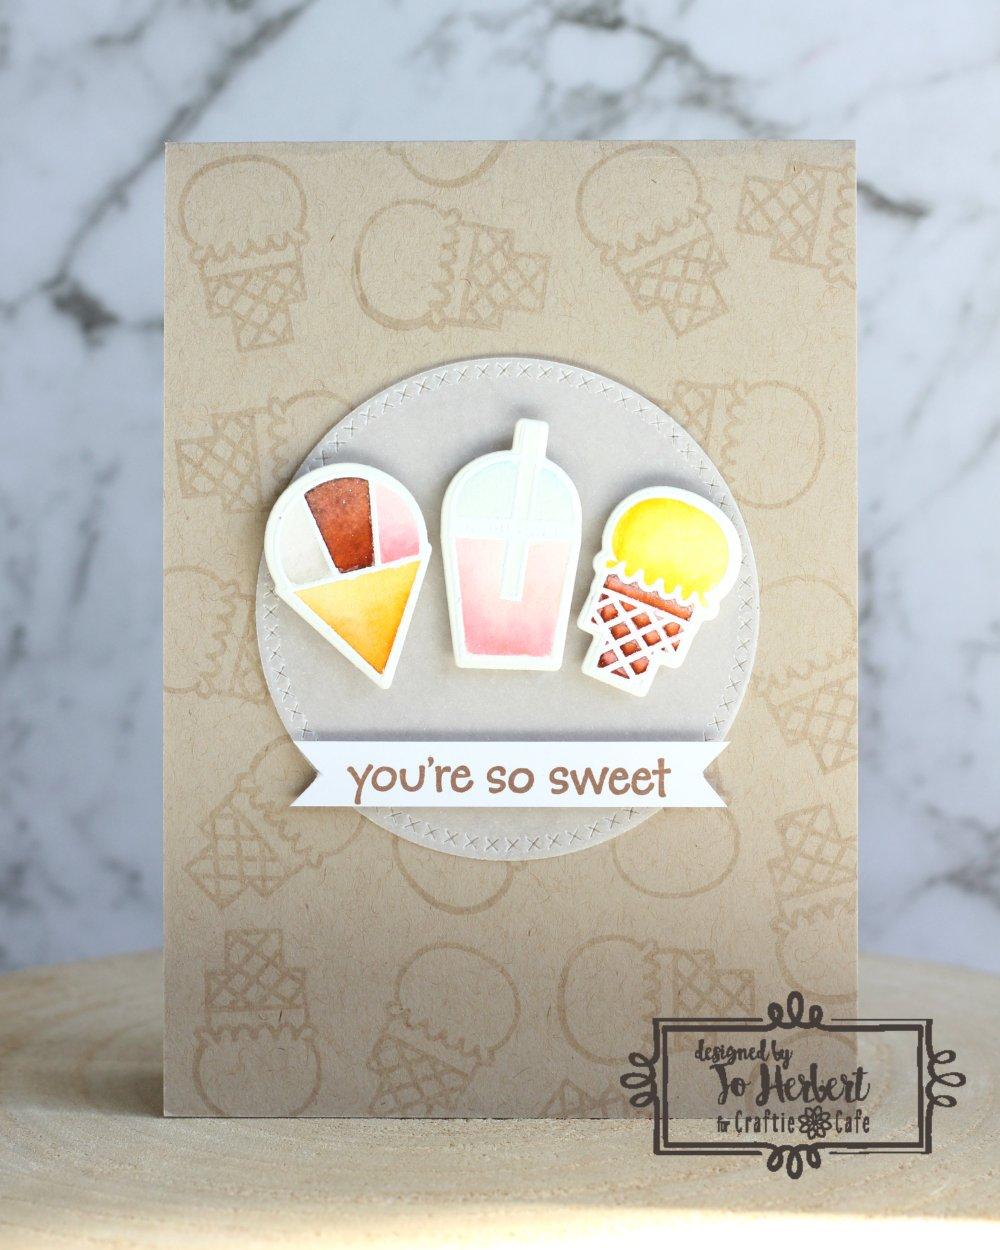 Jo Herbert - 291117 Summer Card pic 4